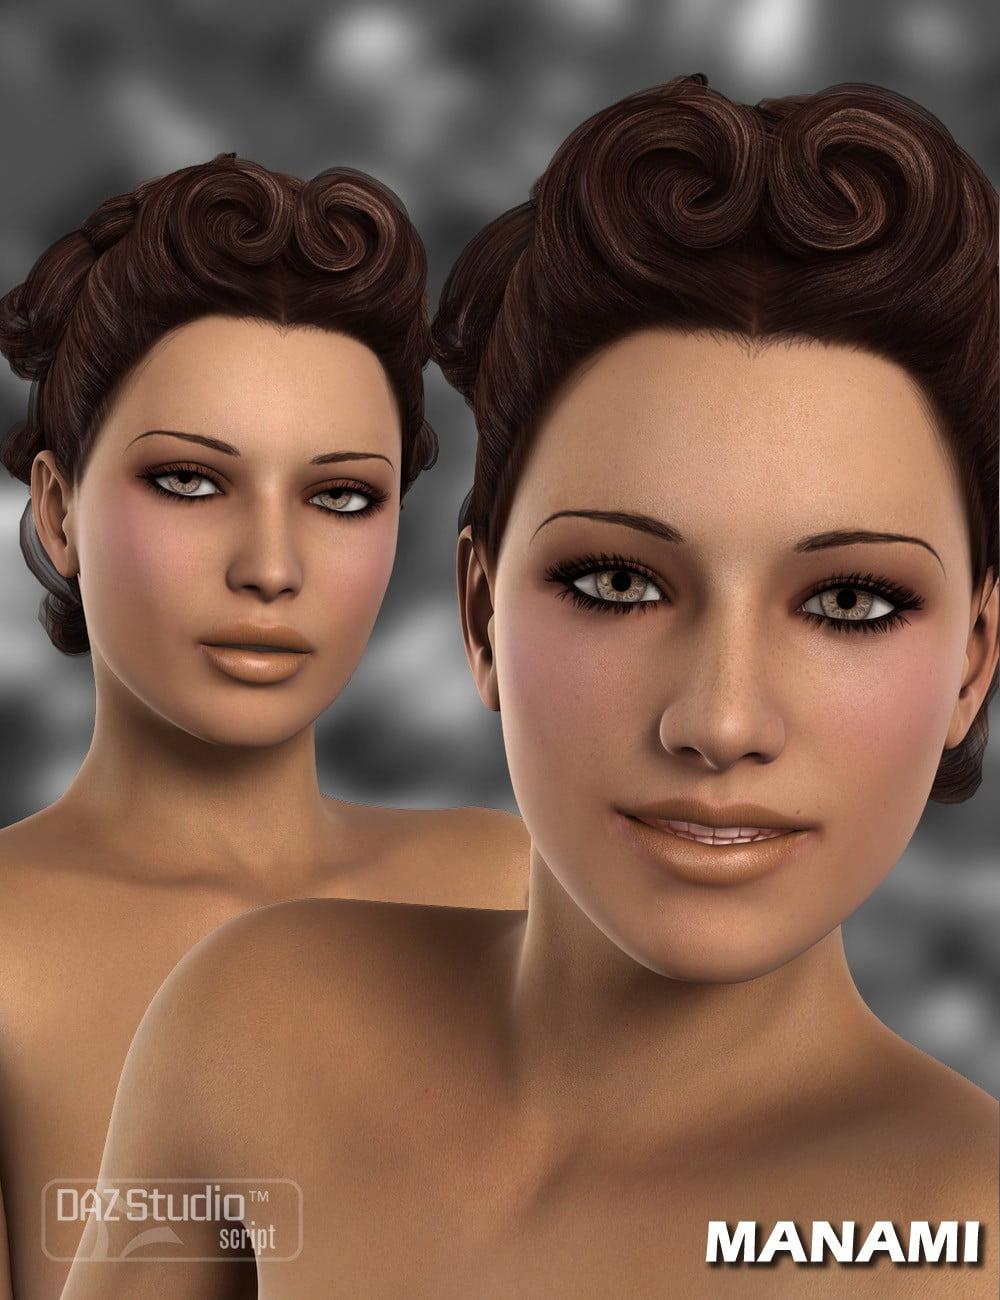 01-victoria-4-skins-batch-converter-to-genesis-2-females-daz3d